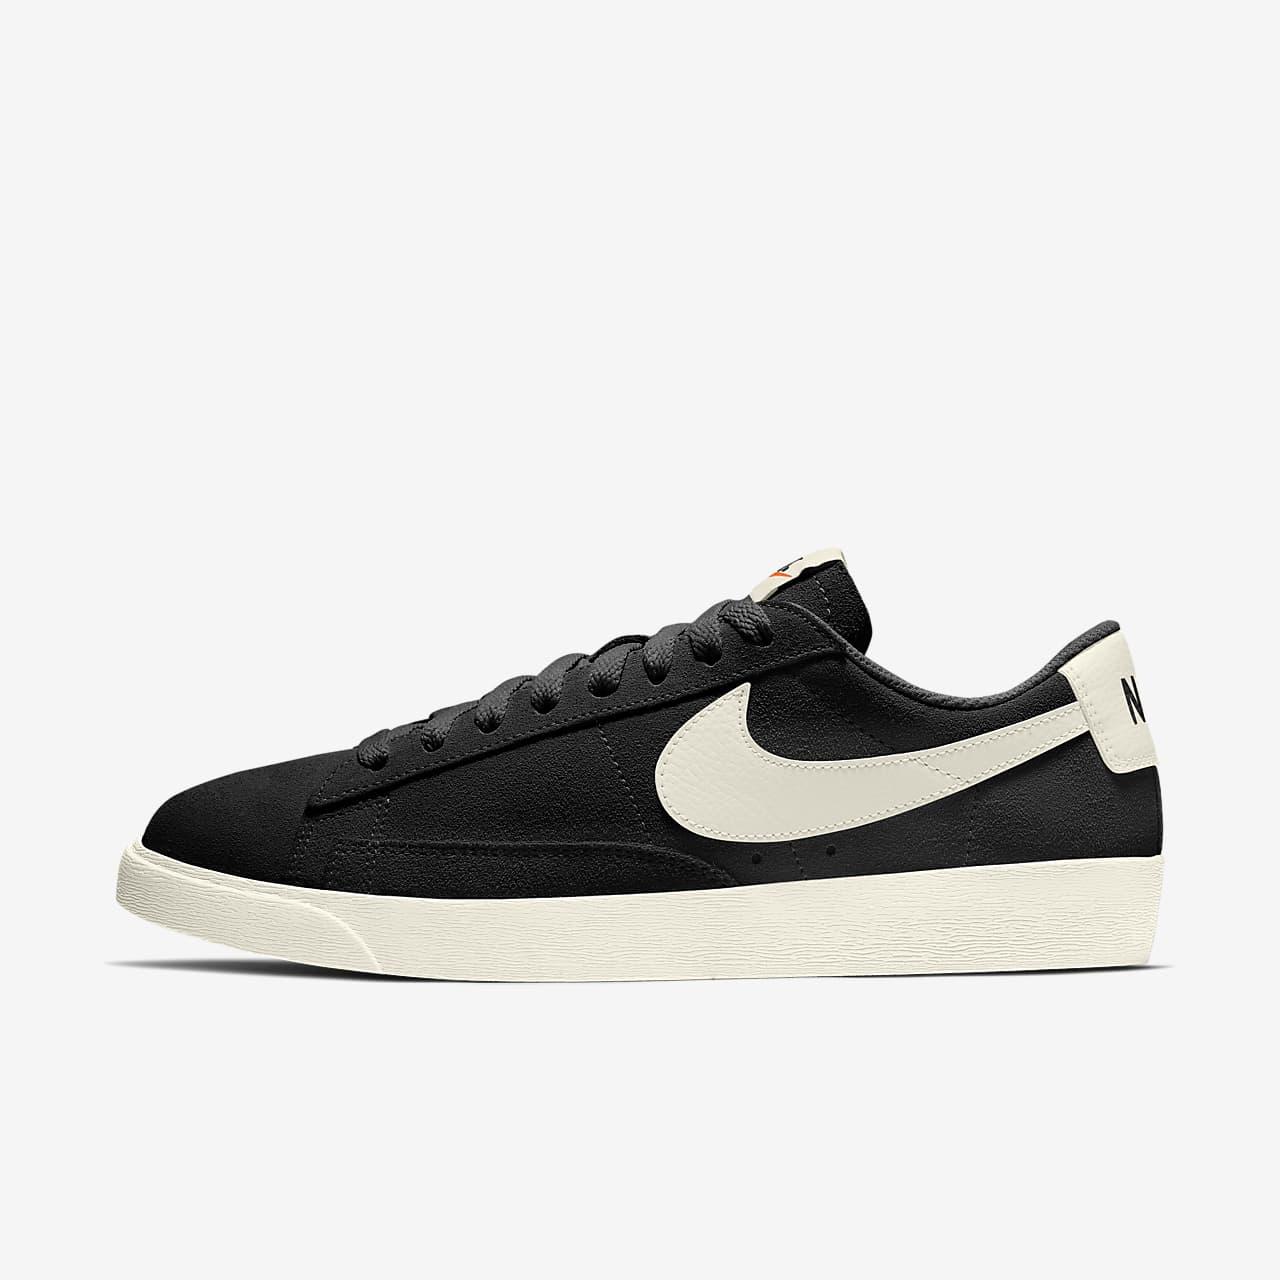 pretty nice 7d24e 5da83 Nike Blazer Low Suede-sko til kvinder